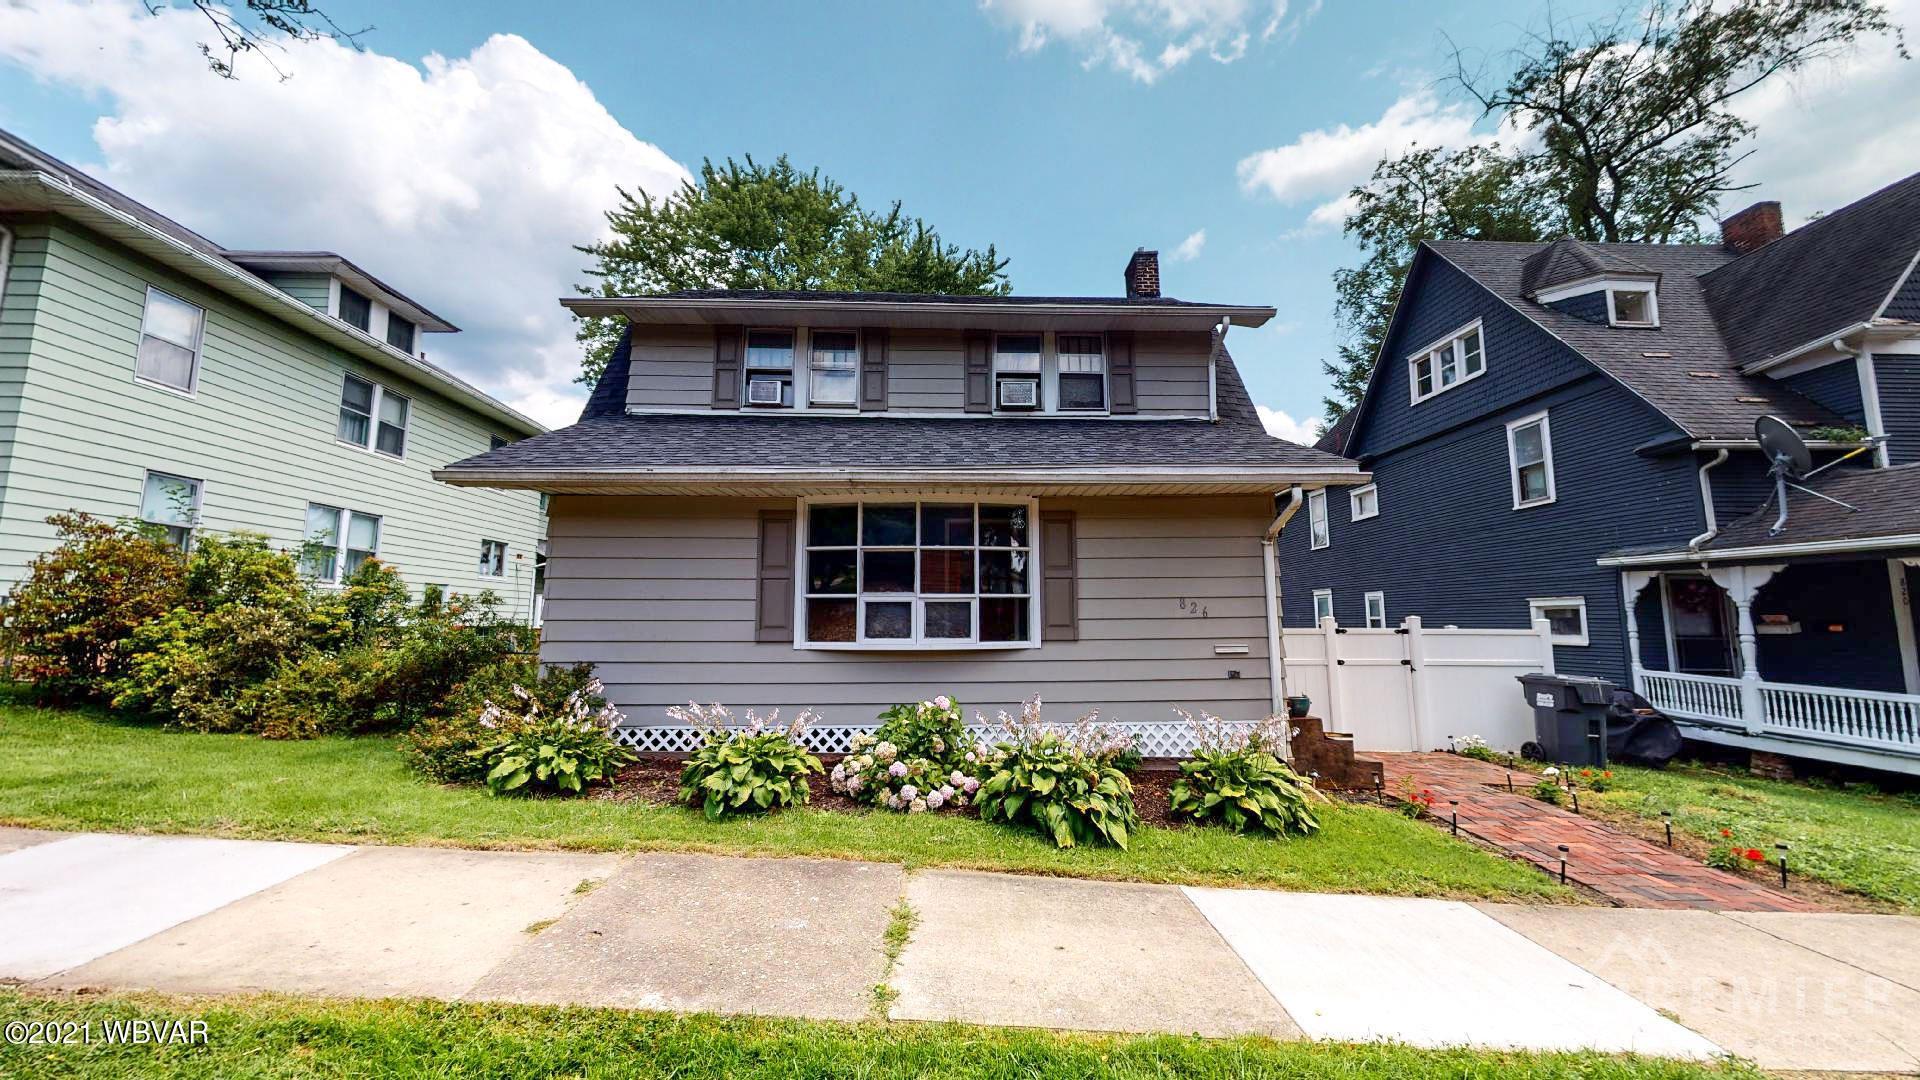 826 5TH AVENUE, Williamsport, PA 17701 - #: WB-93183